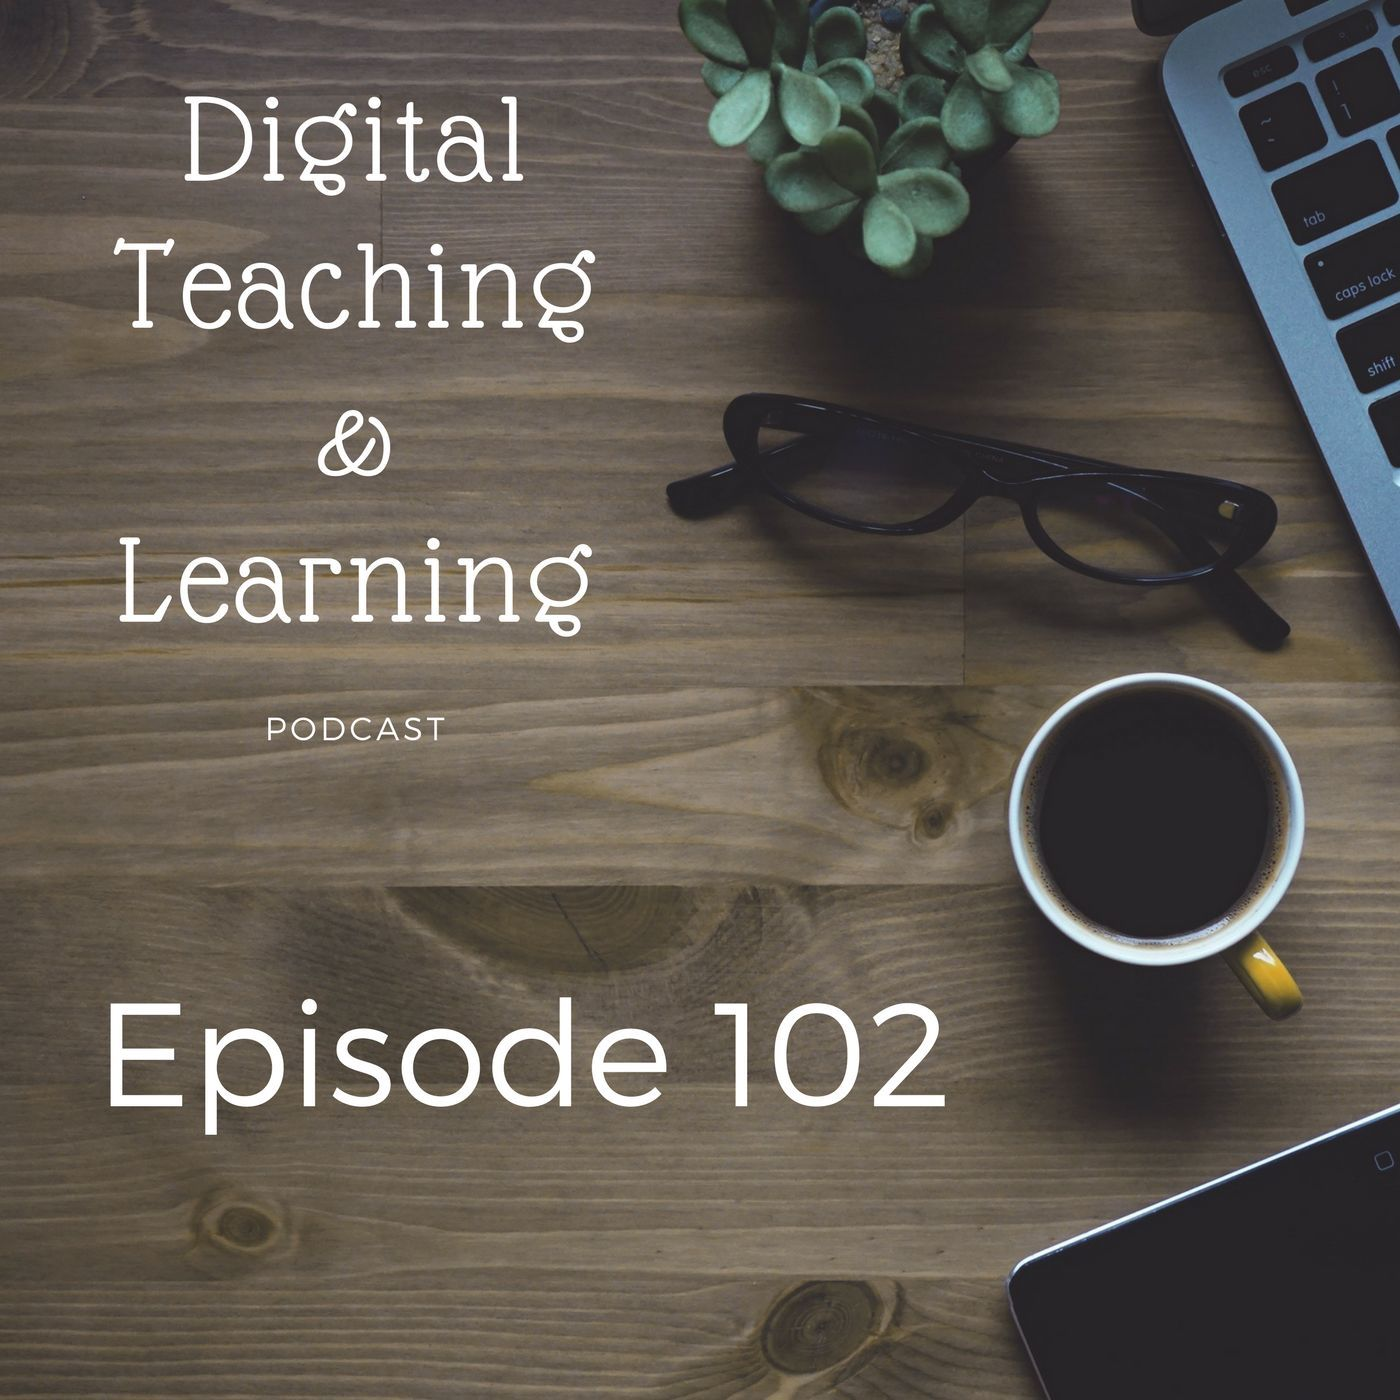 Episode 102 - Digital Devices & Classroom Management